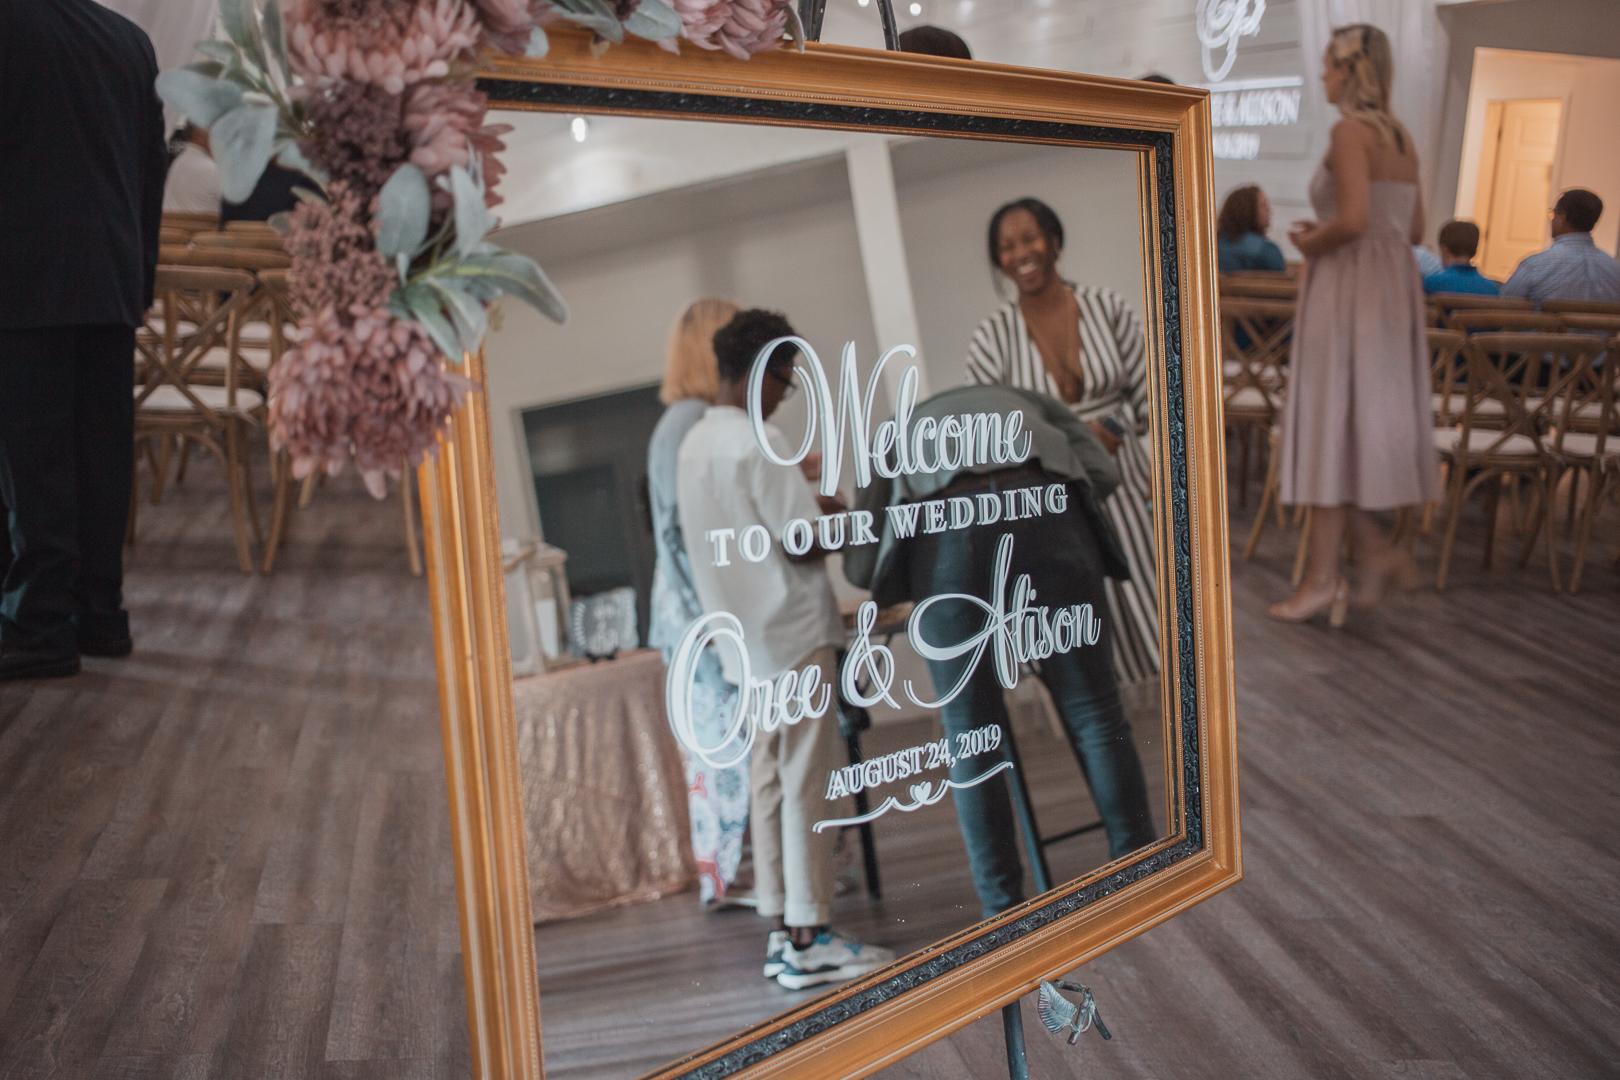 Aloson & Oree's Wedding (8-24-19) Edited5868.jpg